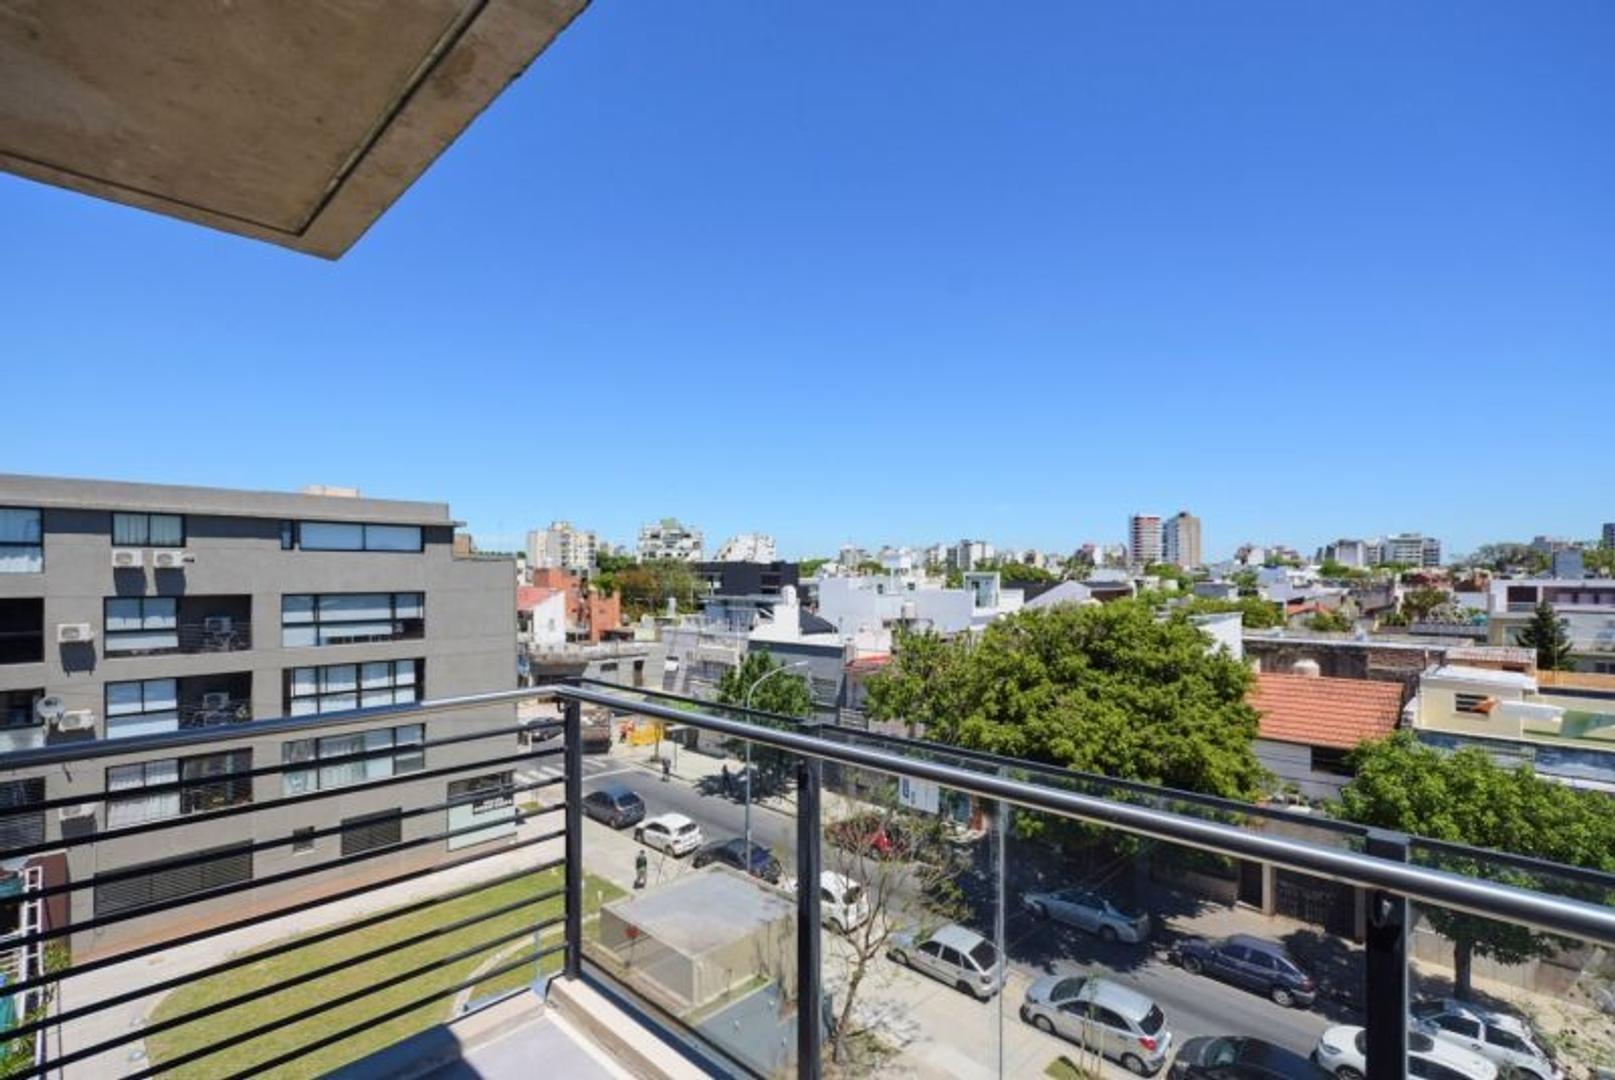 (CDP-CDP-374) Departamento - Venta - Argentina, Capital Federal - DONADO 1700 - Foto 12